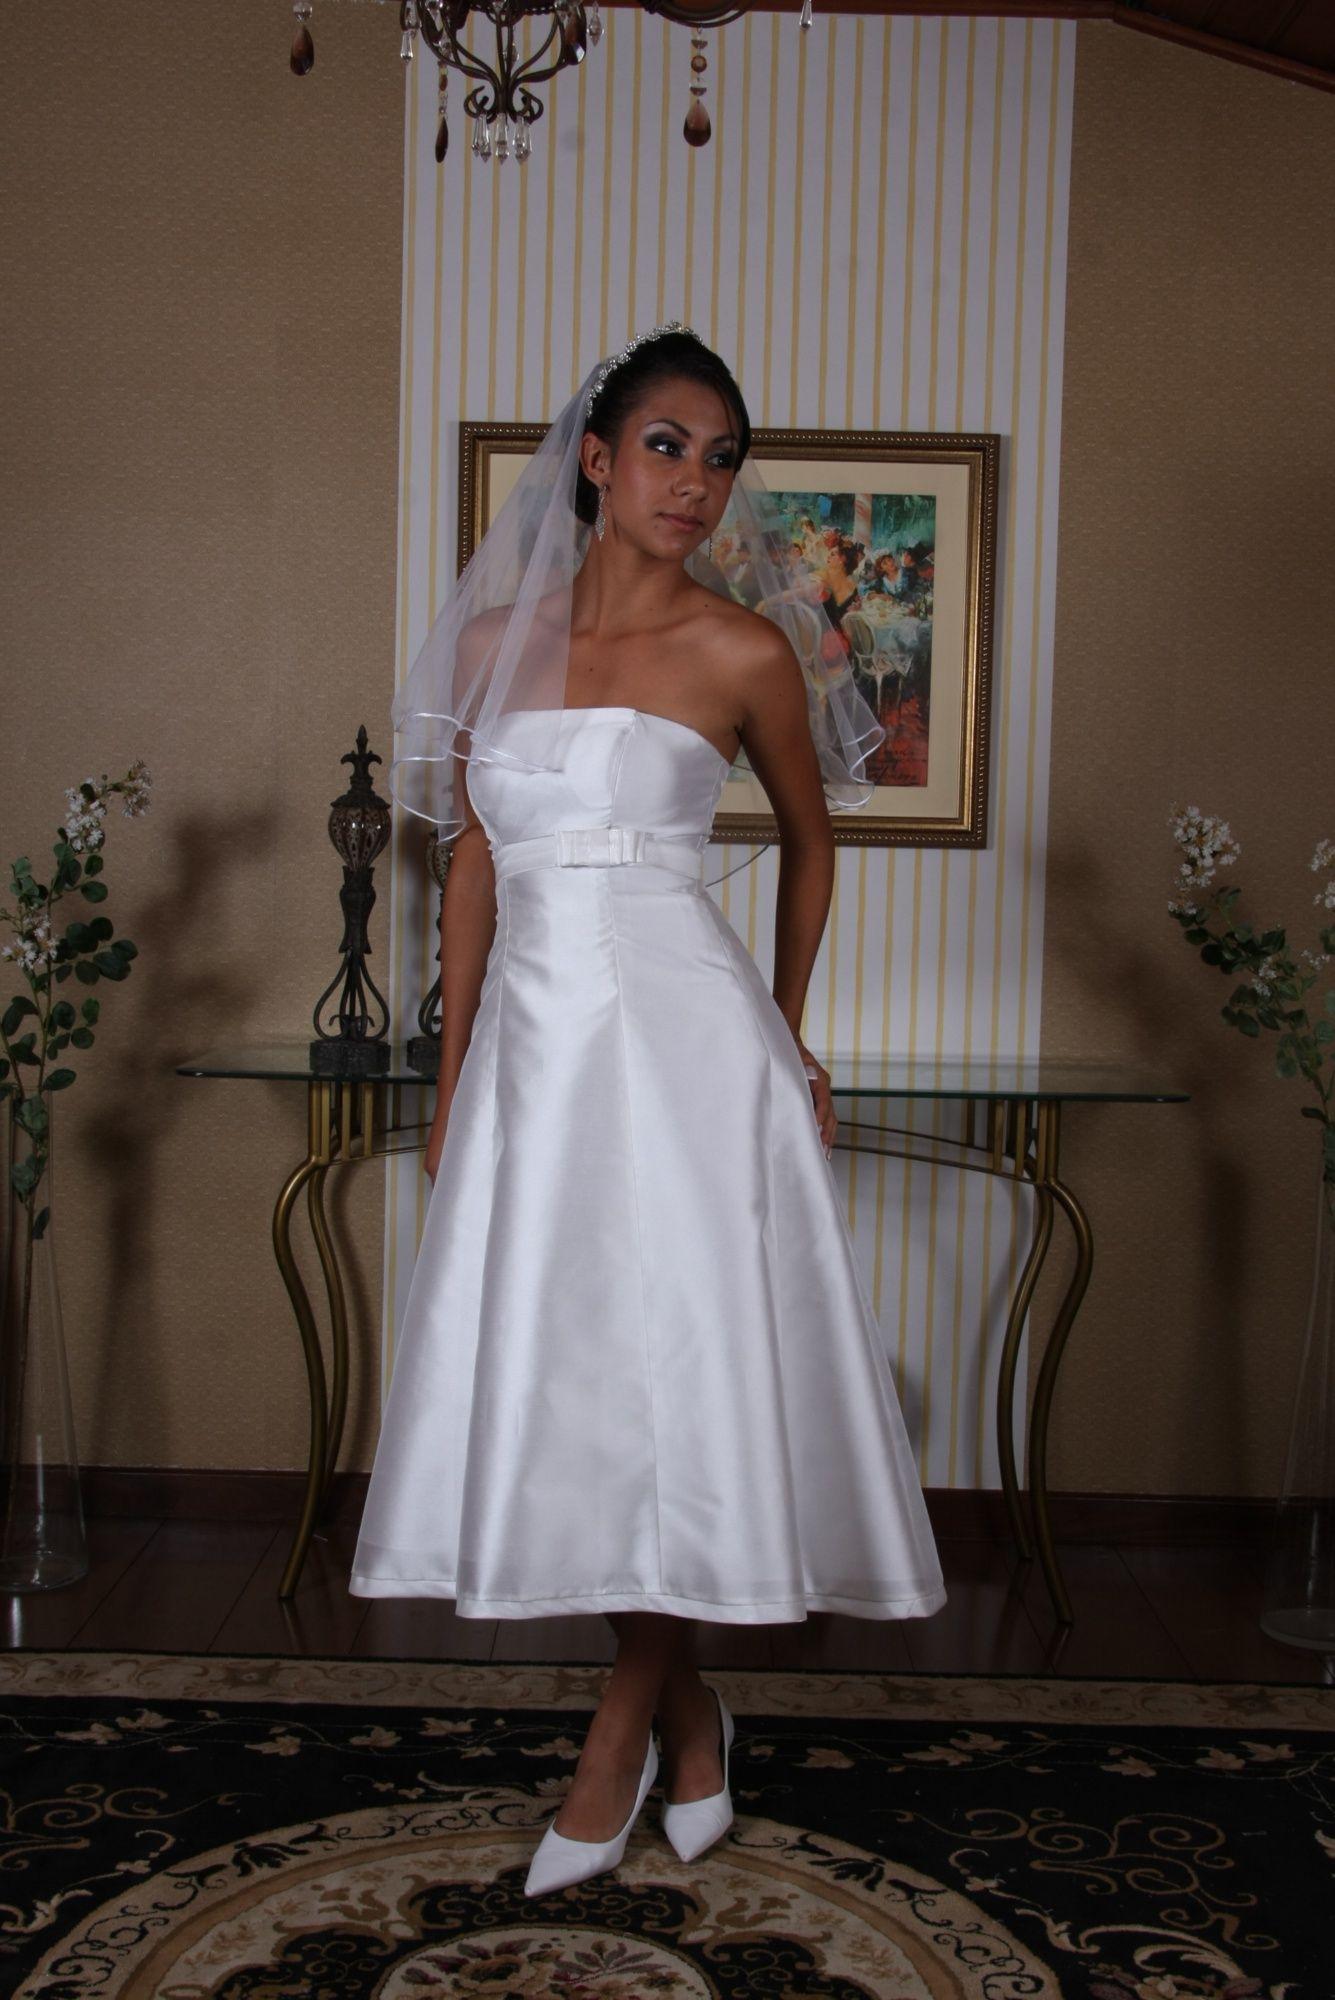 Vestido de Noiva Curto - 2 - Hipnose Alta Costura e Spa para Noivas e Noivos - Campinas - SP Vestido de Noiva, Vestido de Noiva Curto, Hipnose Alta Costura